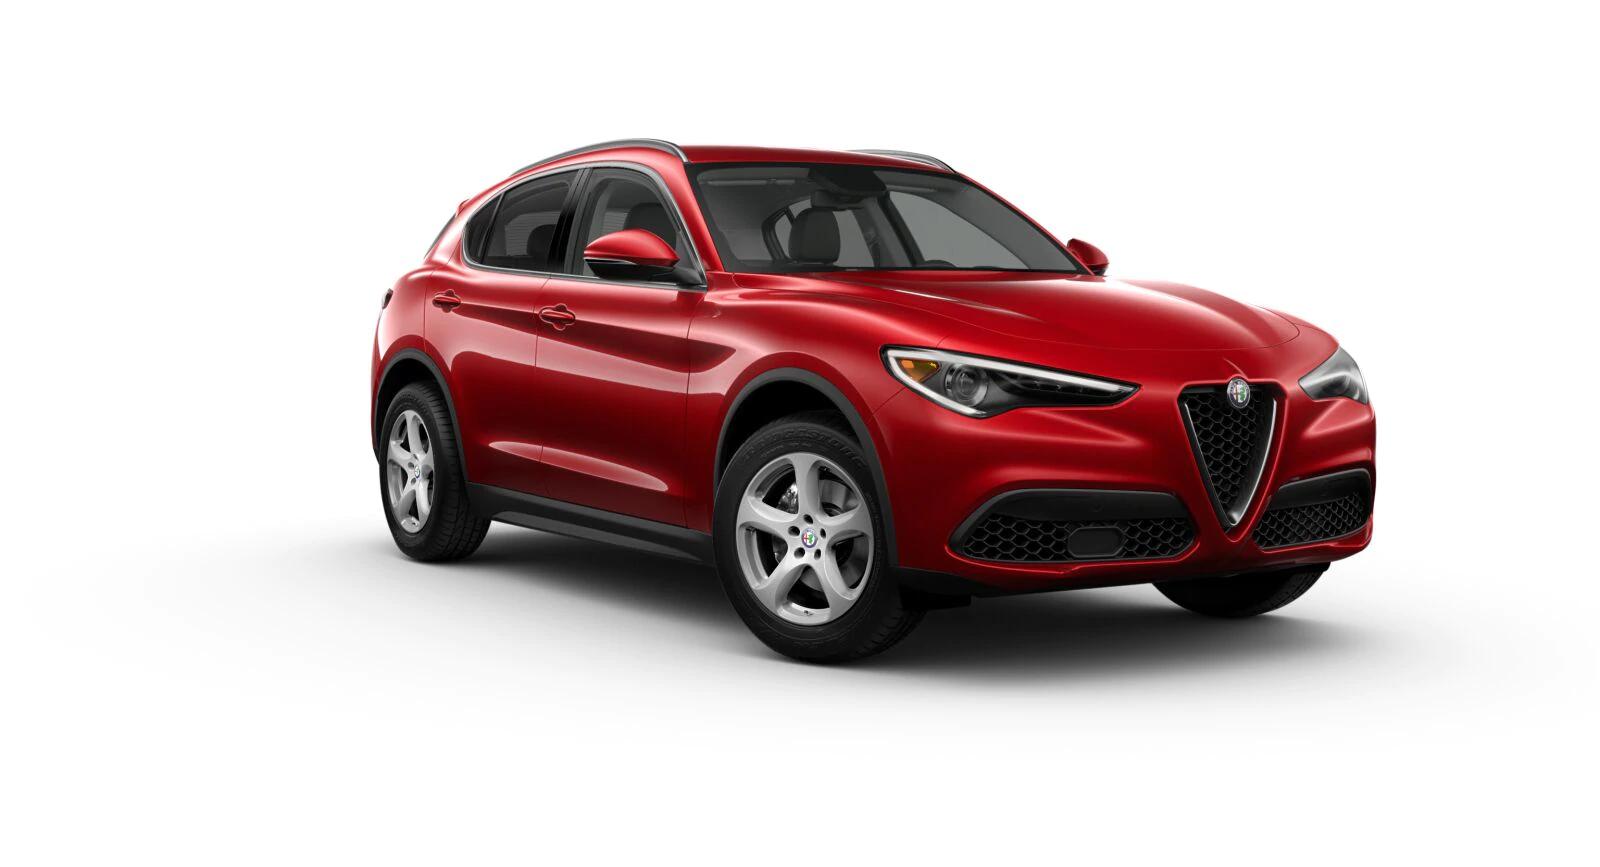 Alfa Romeo Models | 2020 Alfa Romeo Car & SUV Lineup in